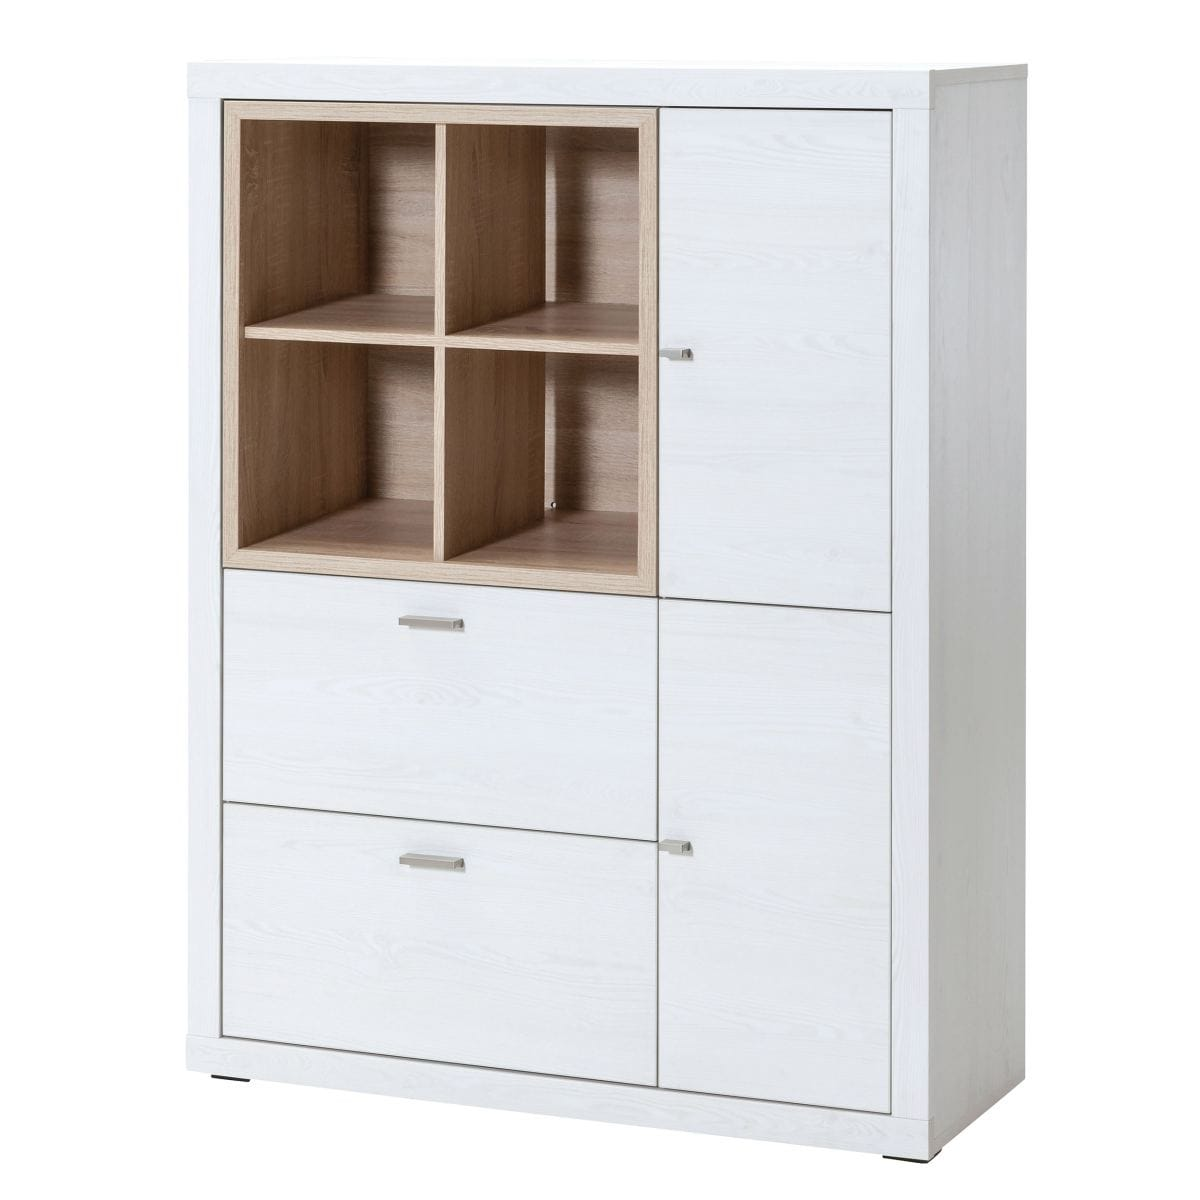 stauraumelement tio you im attraktiven zwei farben look porta. Black Bedroom Furniture Sets. Home Design Ideas